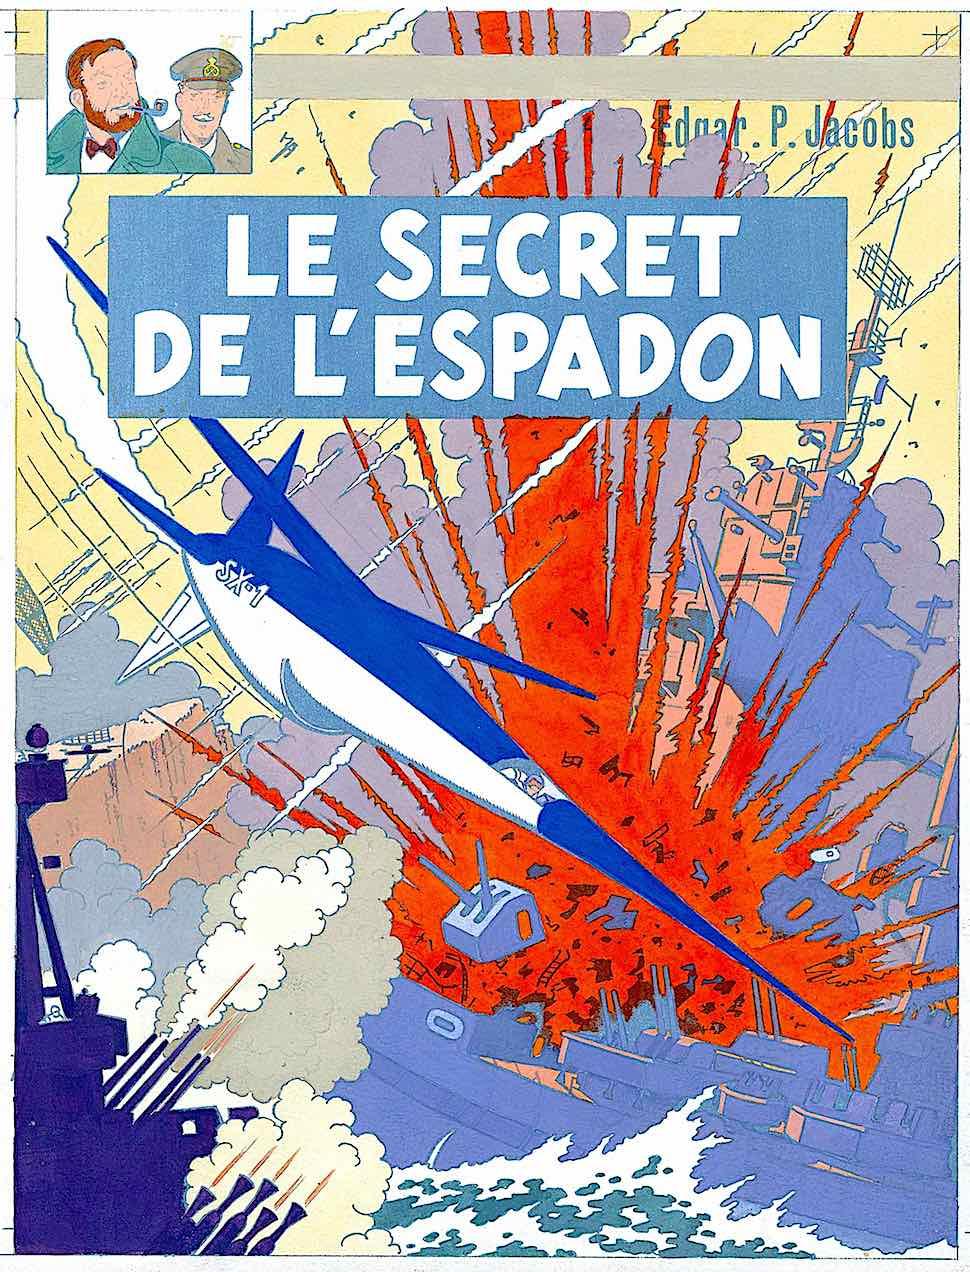 Edgar P. Jacobs comic art, a red explosion